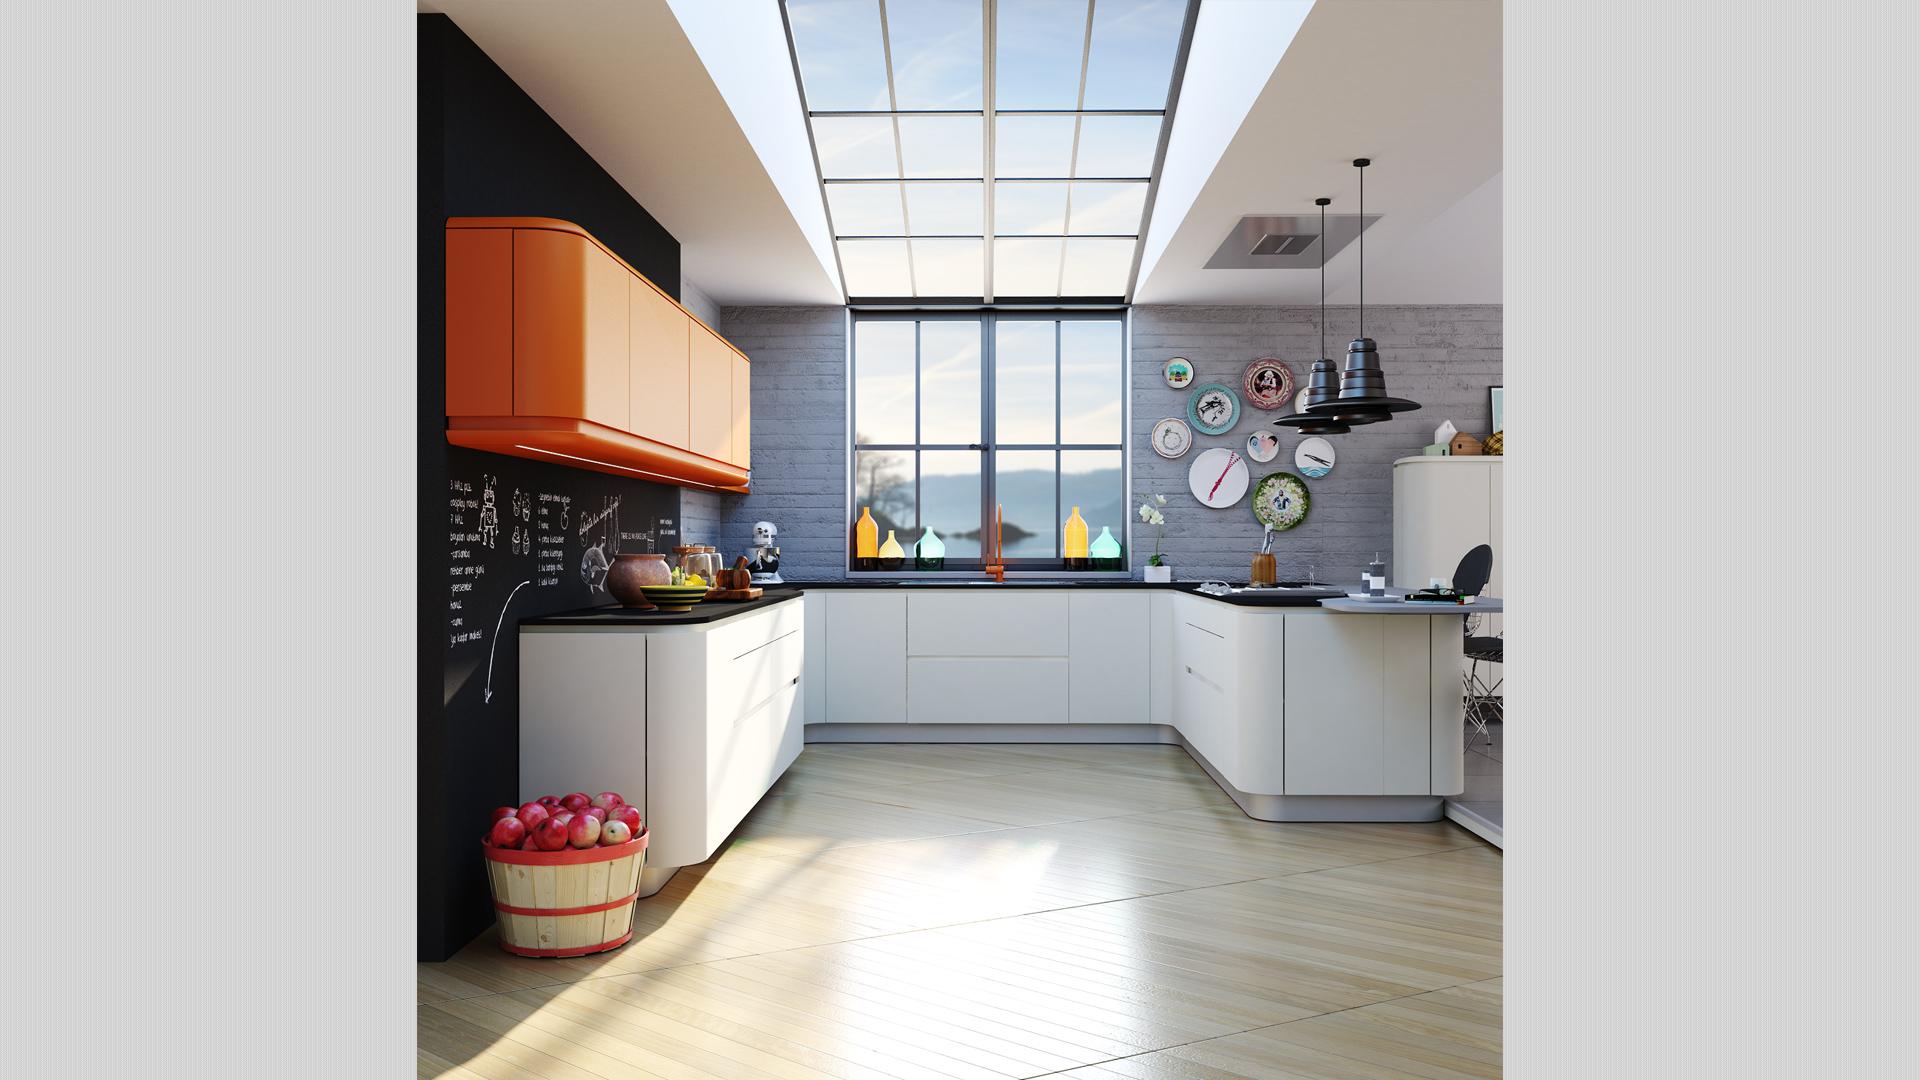 Eczacıbaşı Intema / 3D Set Design + Photorealistic Visualisation